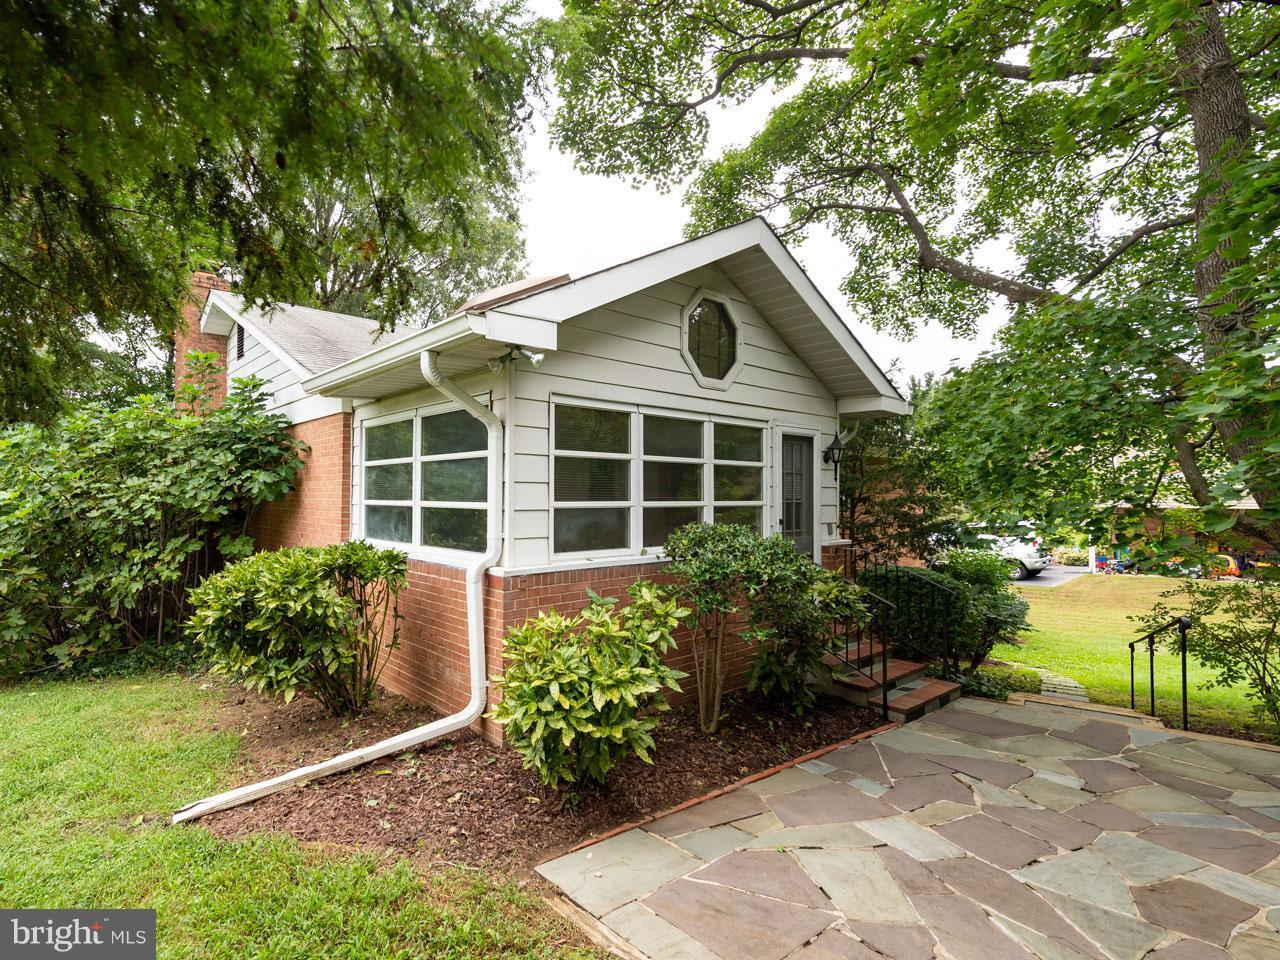 VAFX300106-301103780390-2021-09-05-14-14-29  |   | Alexandria Delaware Real Estate For Sale | MLS# Vafx300106  - Best of Northern Virginia